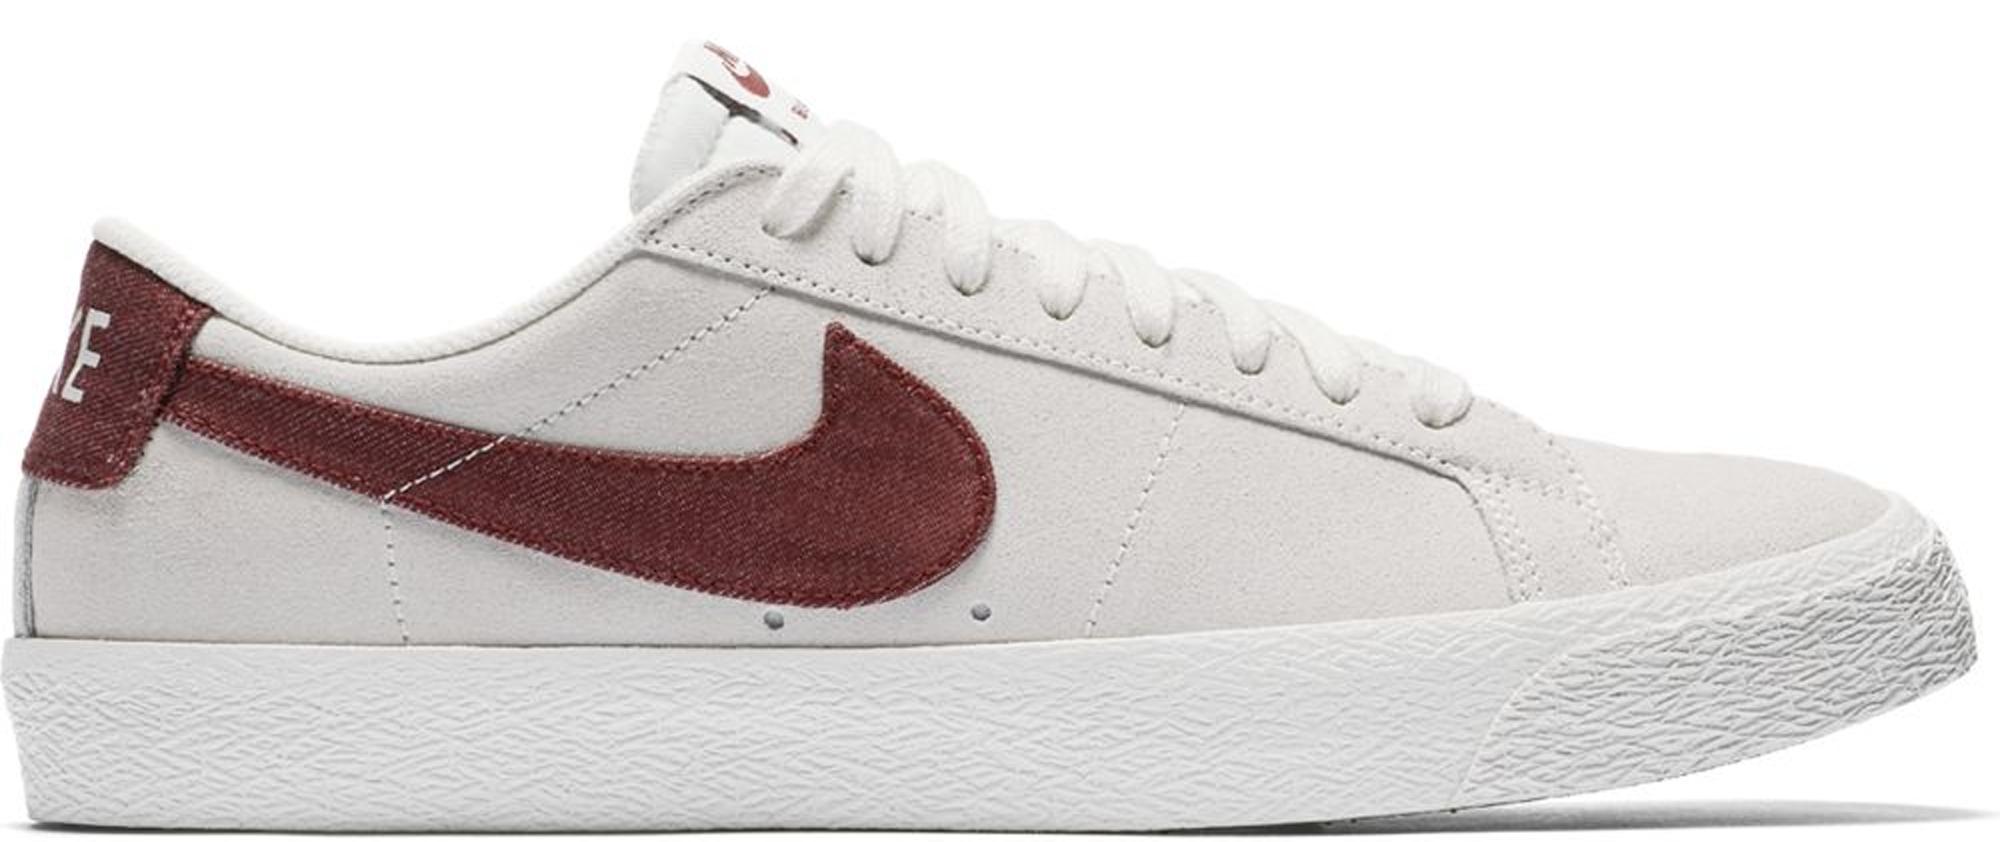 Nike SB Blazer Low Summit White Dark